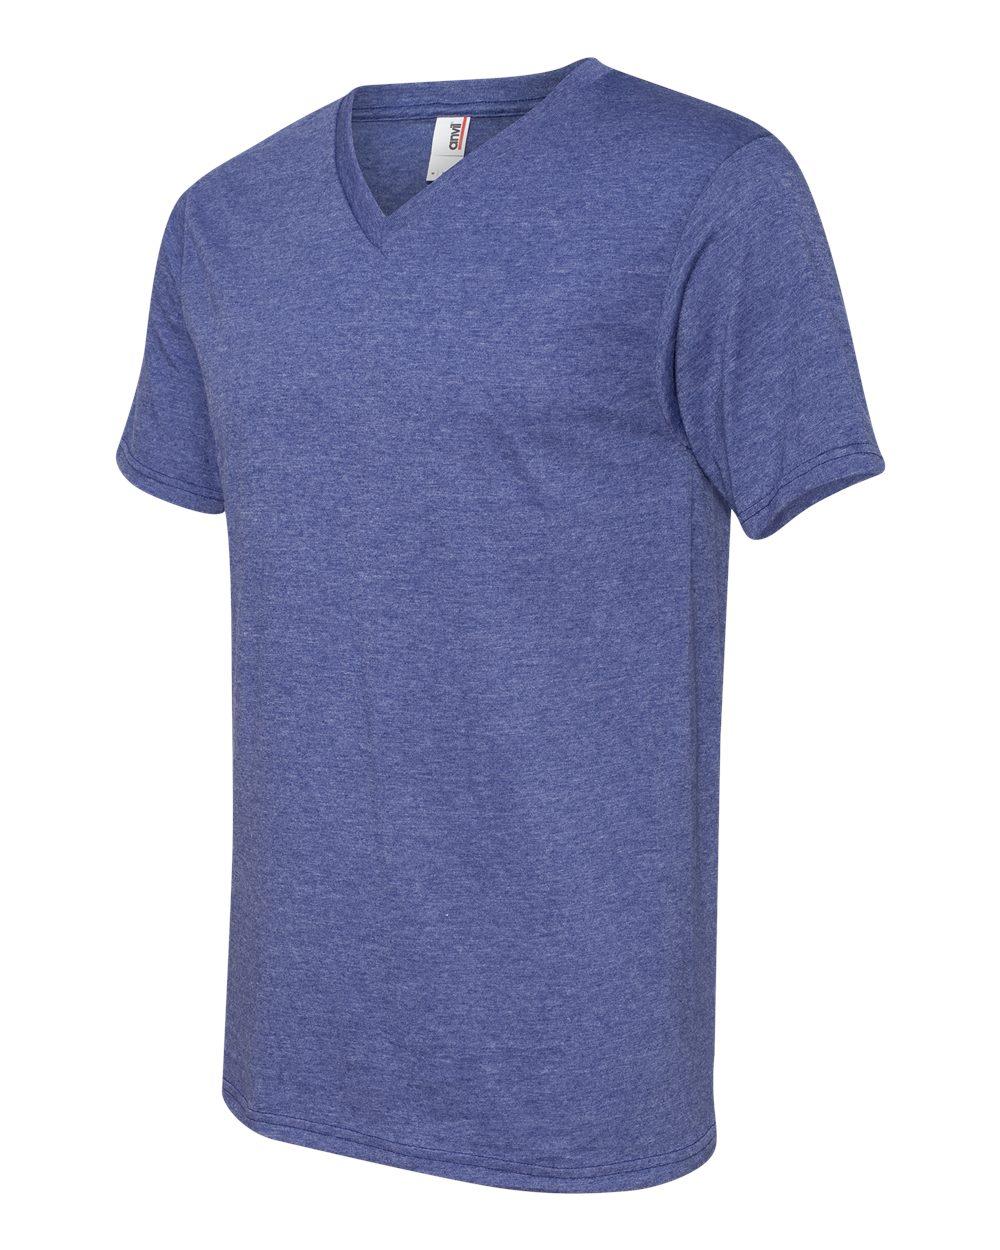 Anvil-Men-039-s-Lightweight-V-Neck-T-Shirt-982-S-3XL thumbnail 12